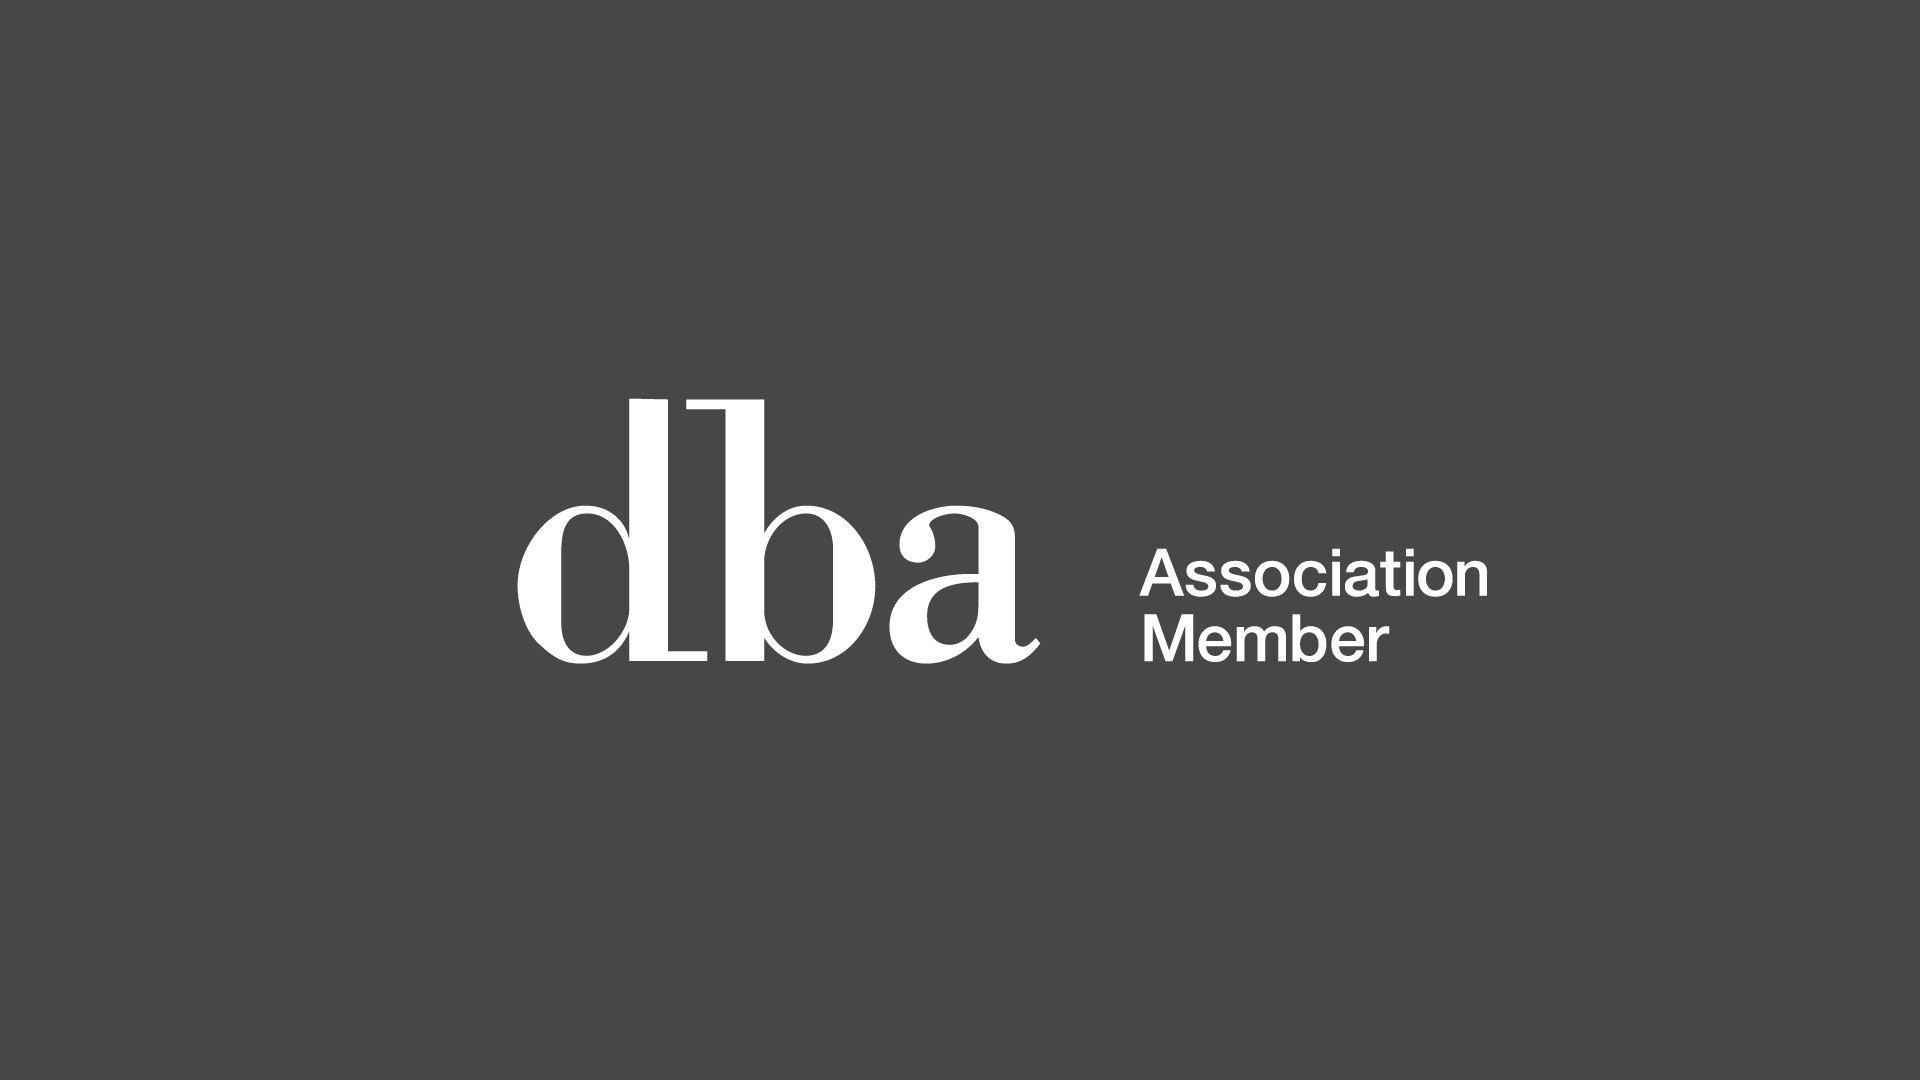 Design Business Association logo - Association Member